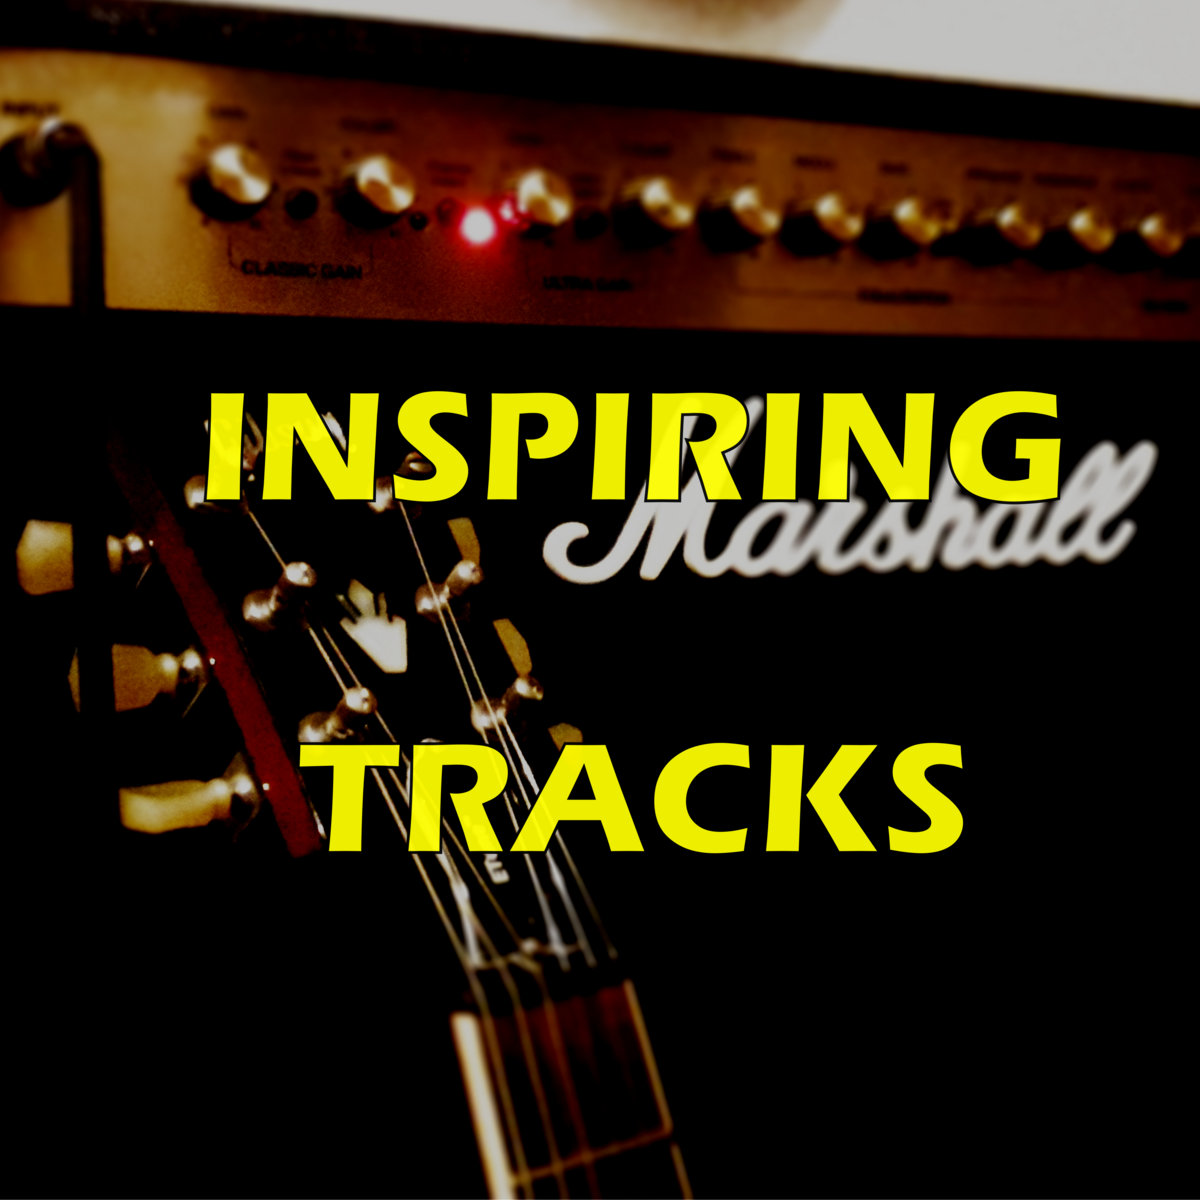 80's style Power Metal - Drumless Backing Track | Inspiring